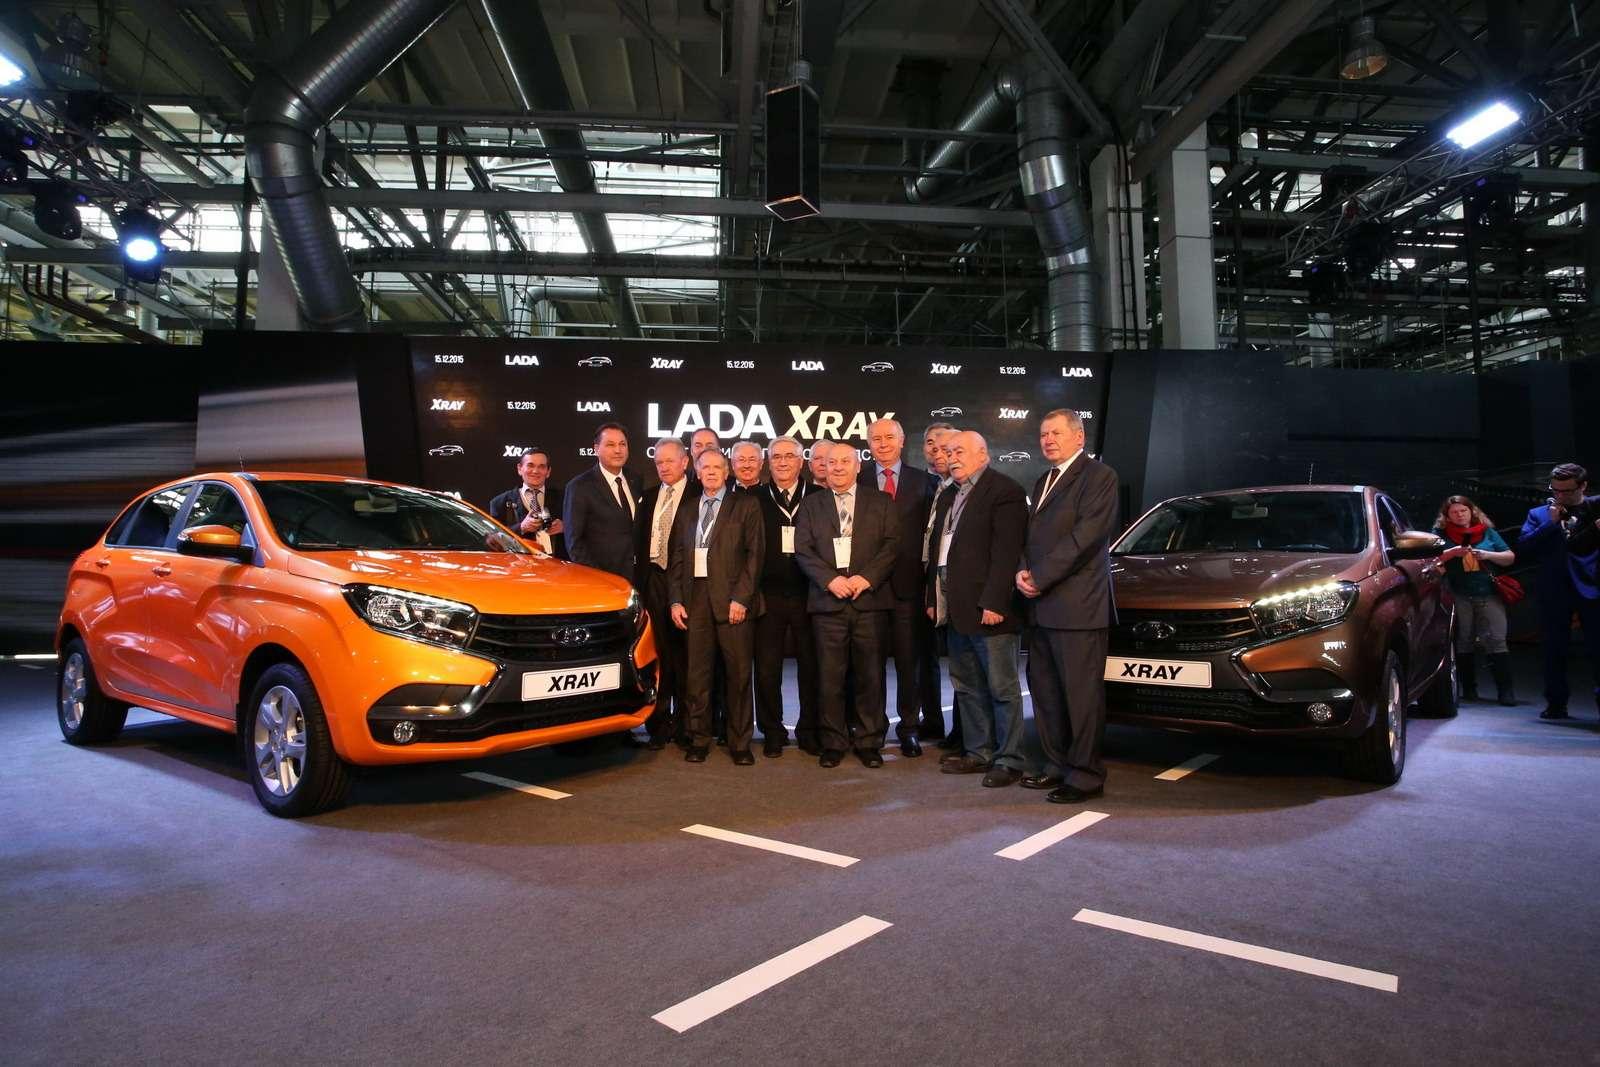 Lada XRAY 0255_новый размер